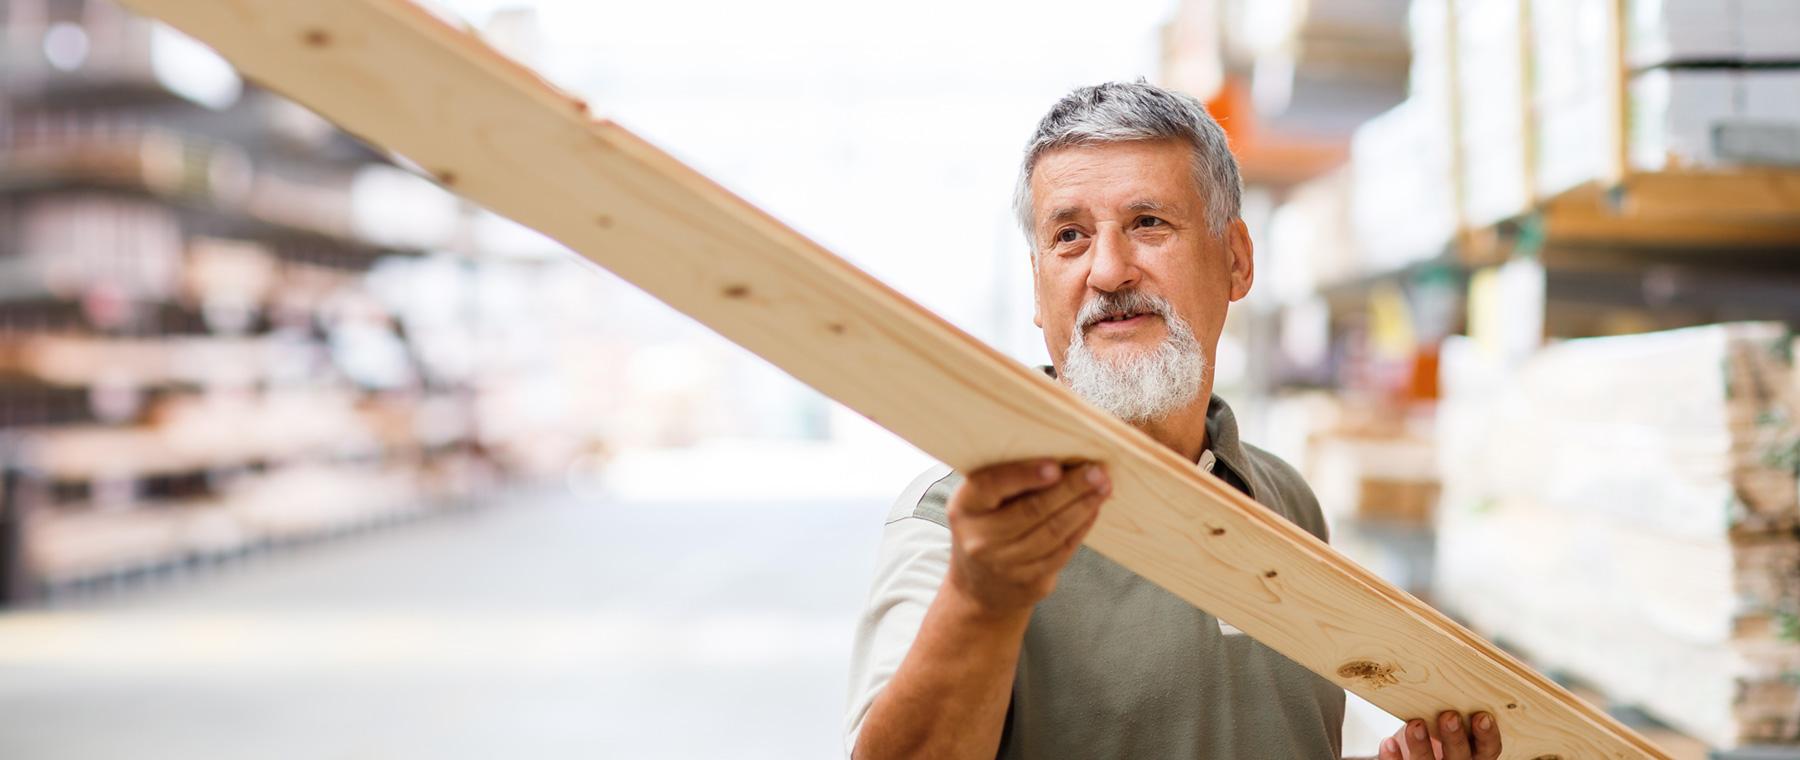 Highest Quality Construction